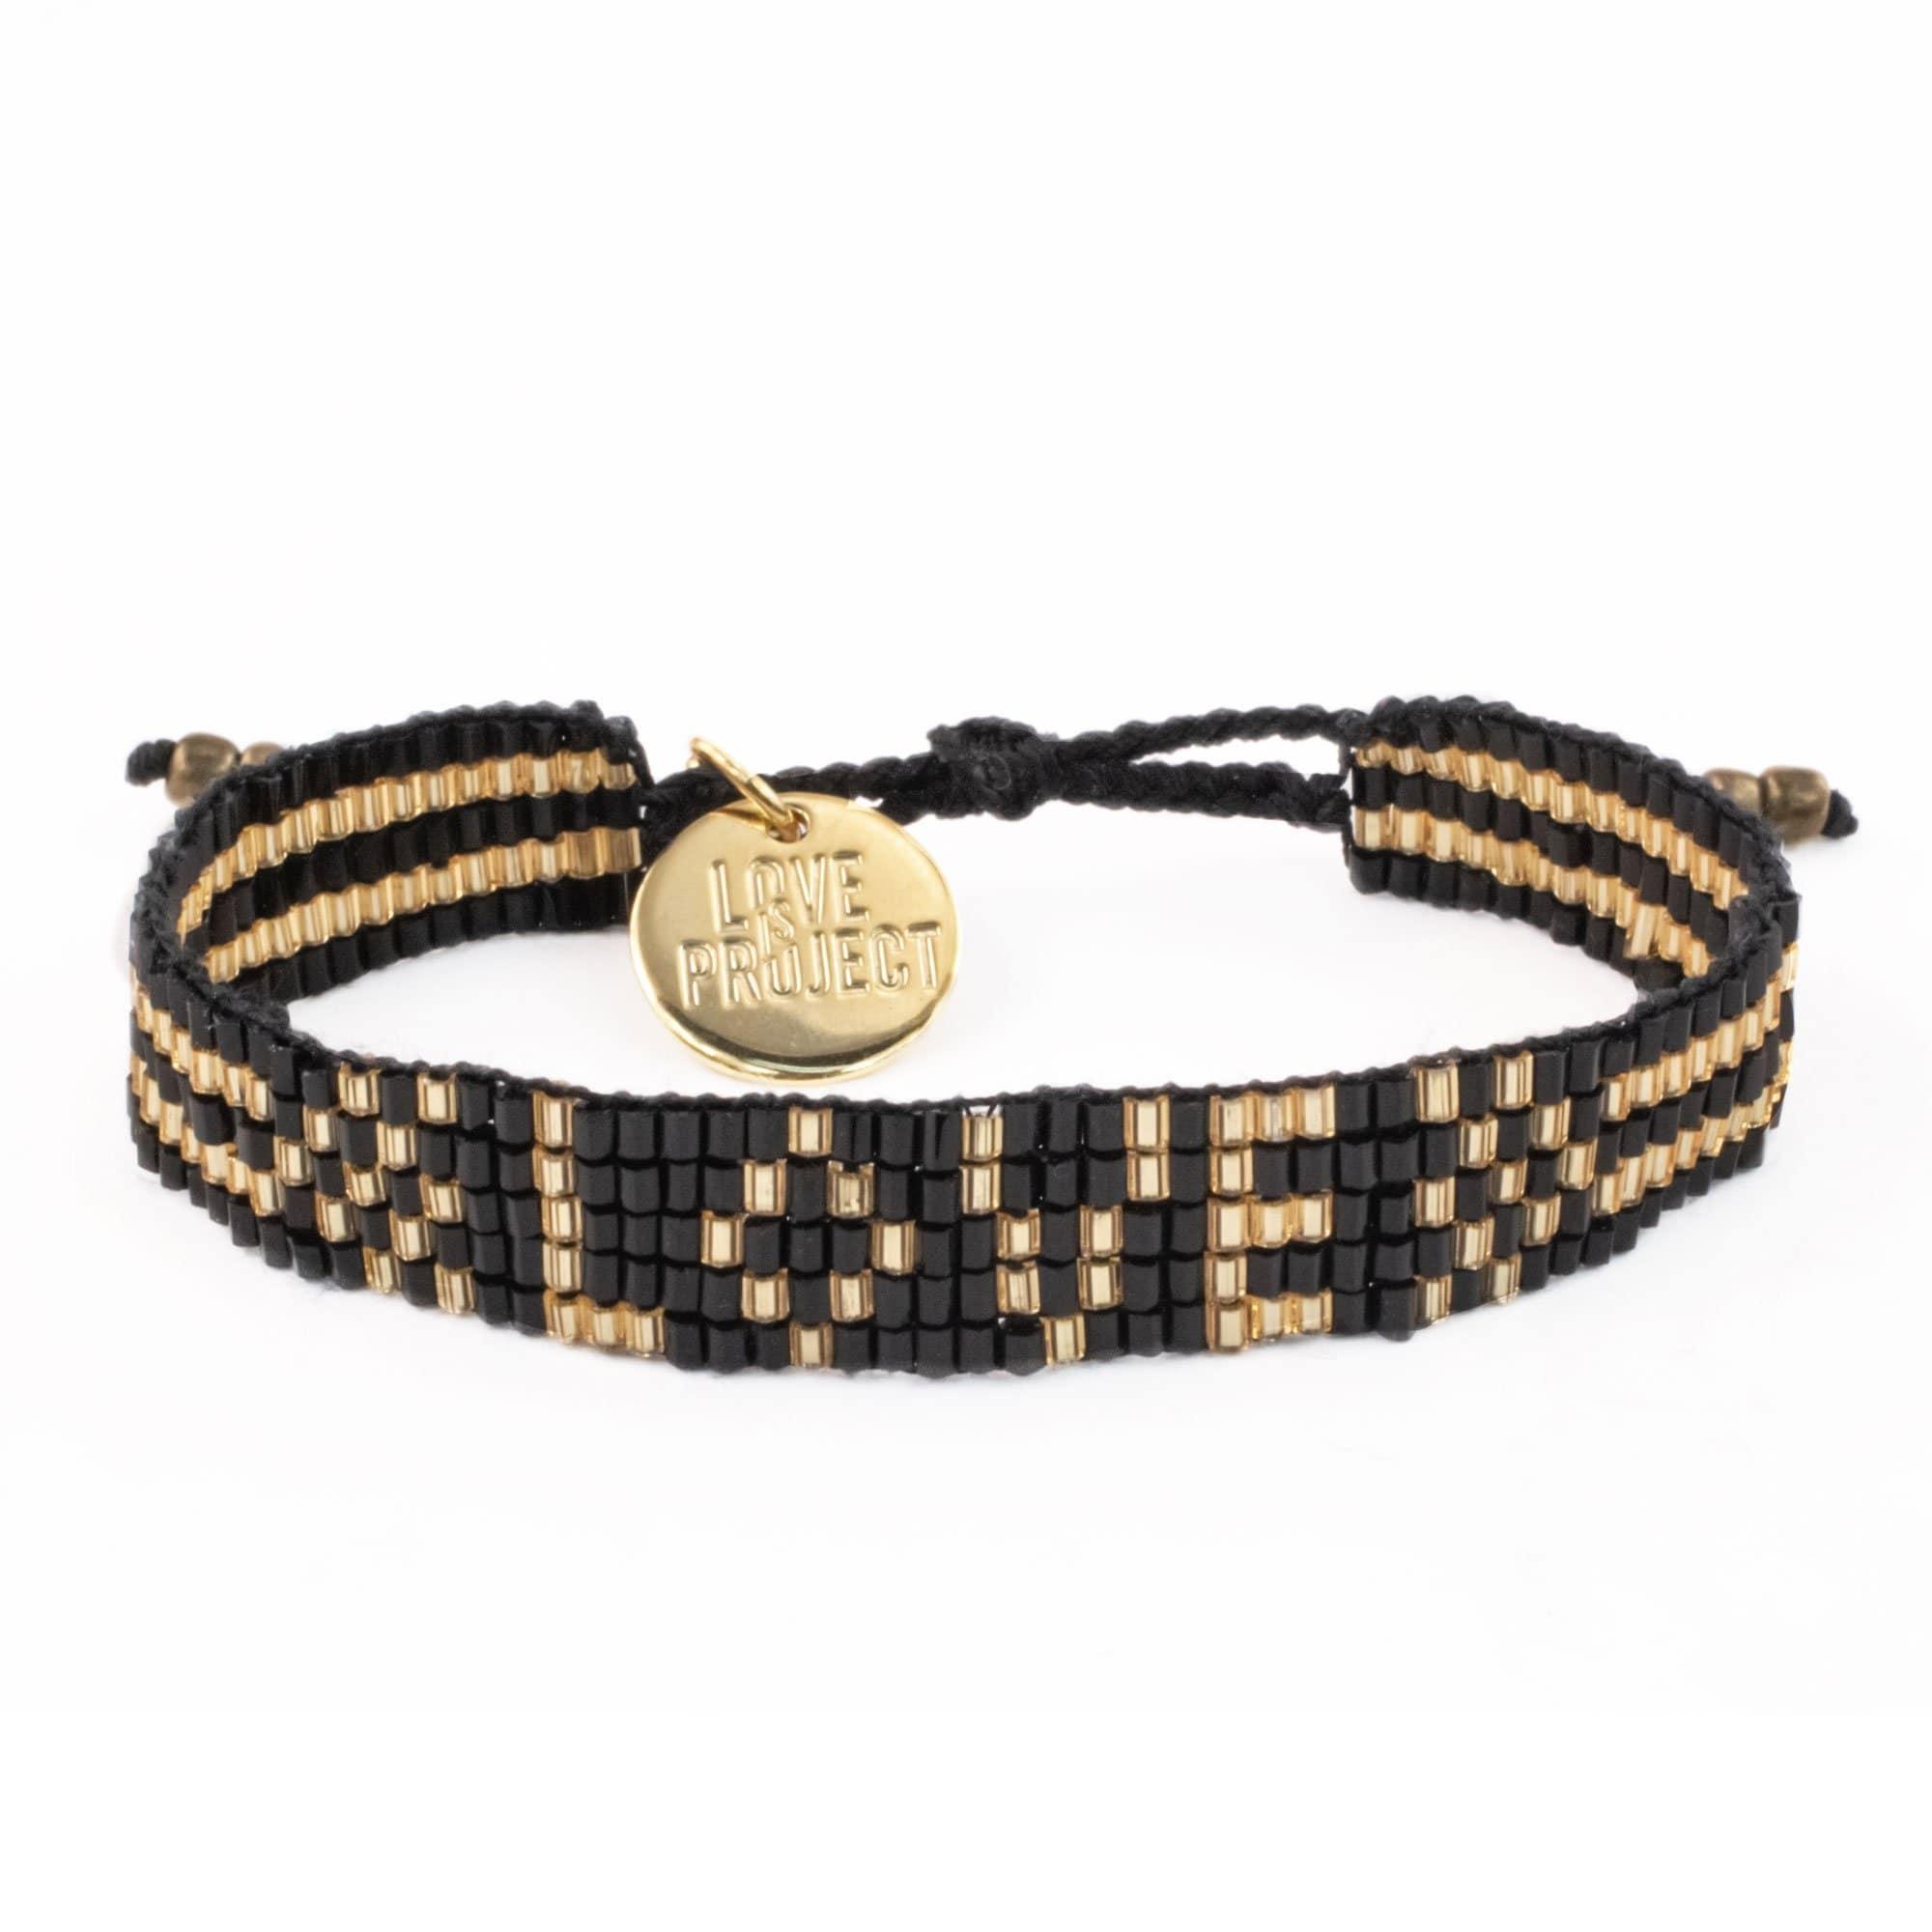 Love Project Seed Bead LOVE Bracelet - Black